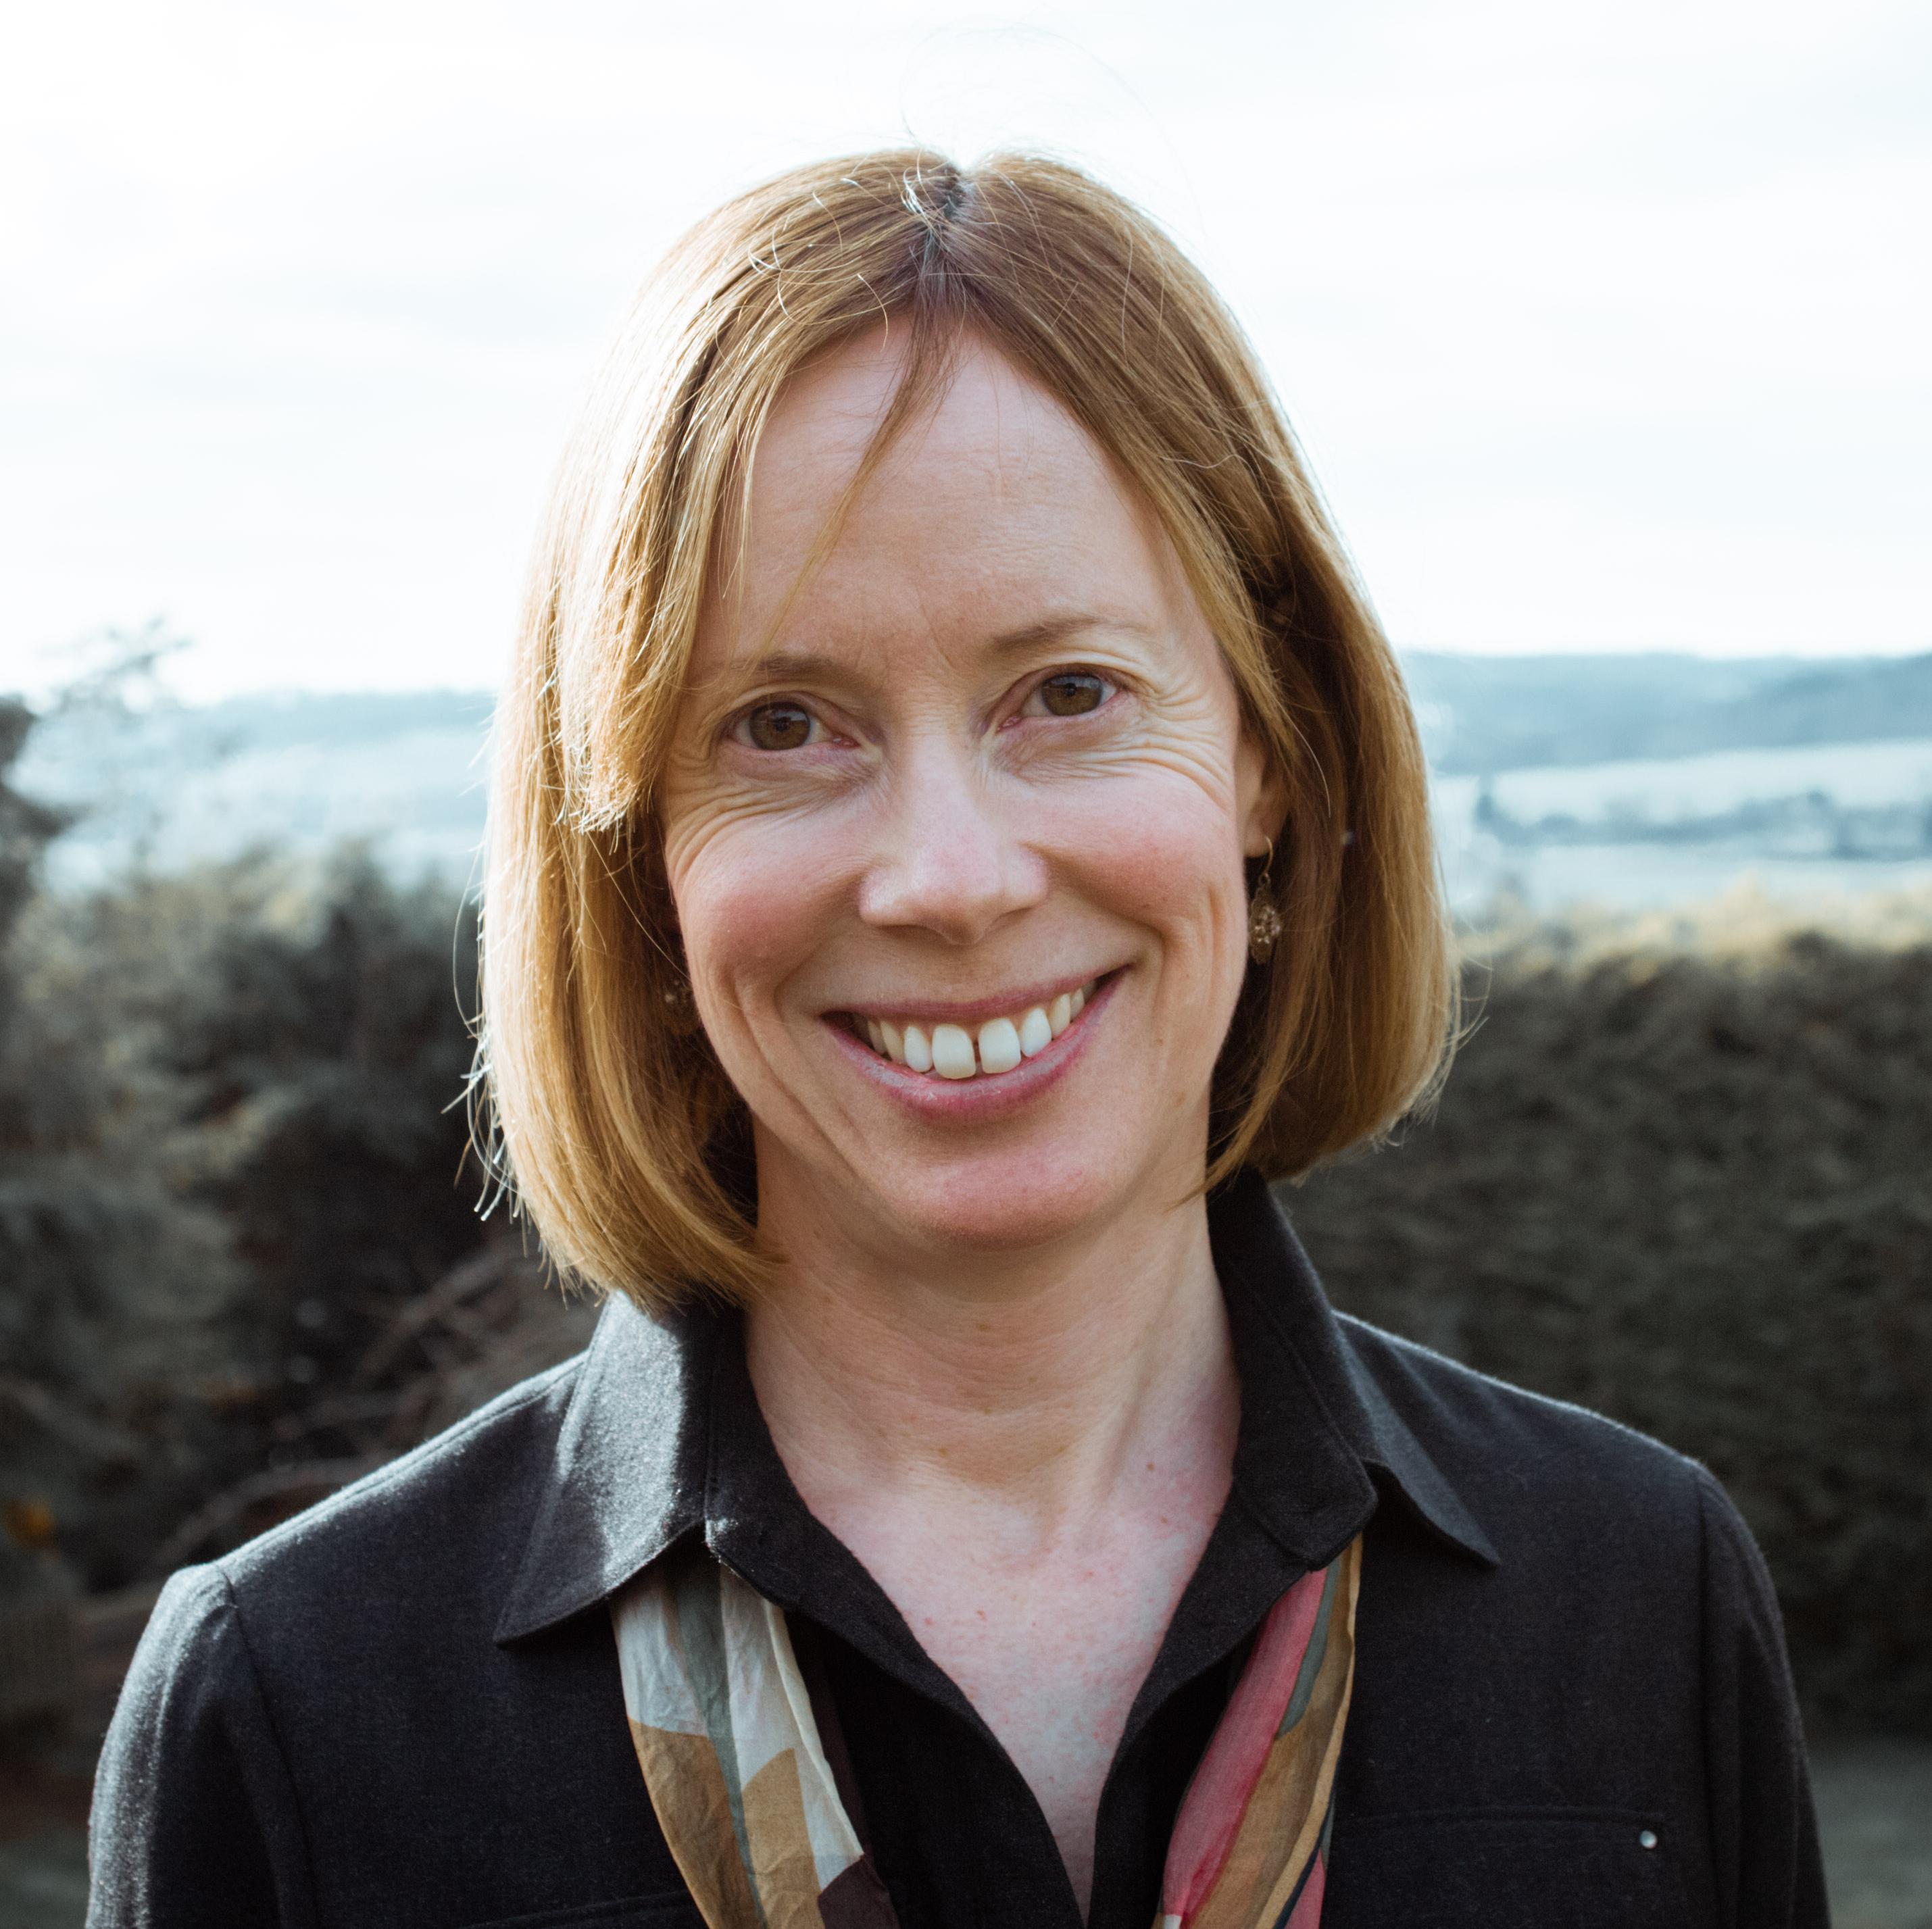 Jennifer Conlon